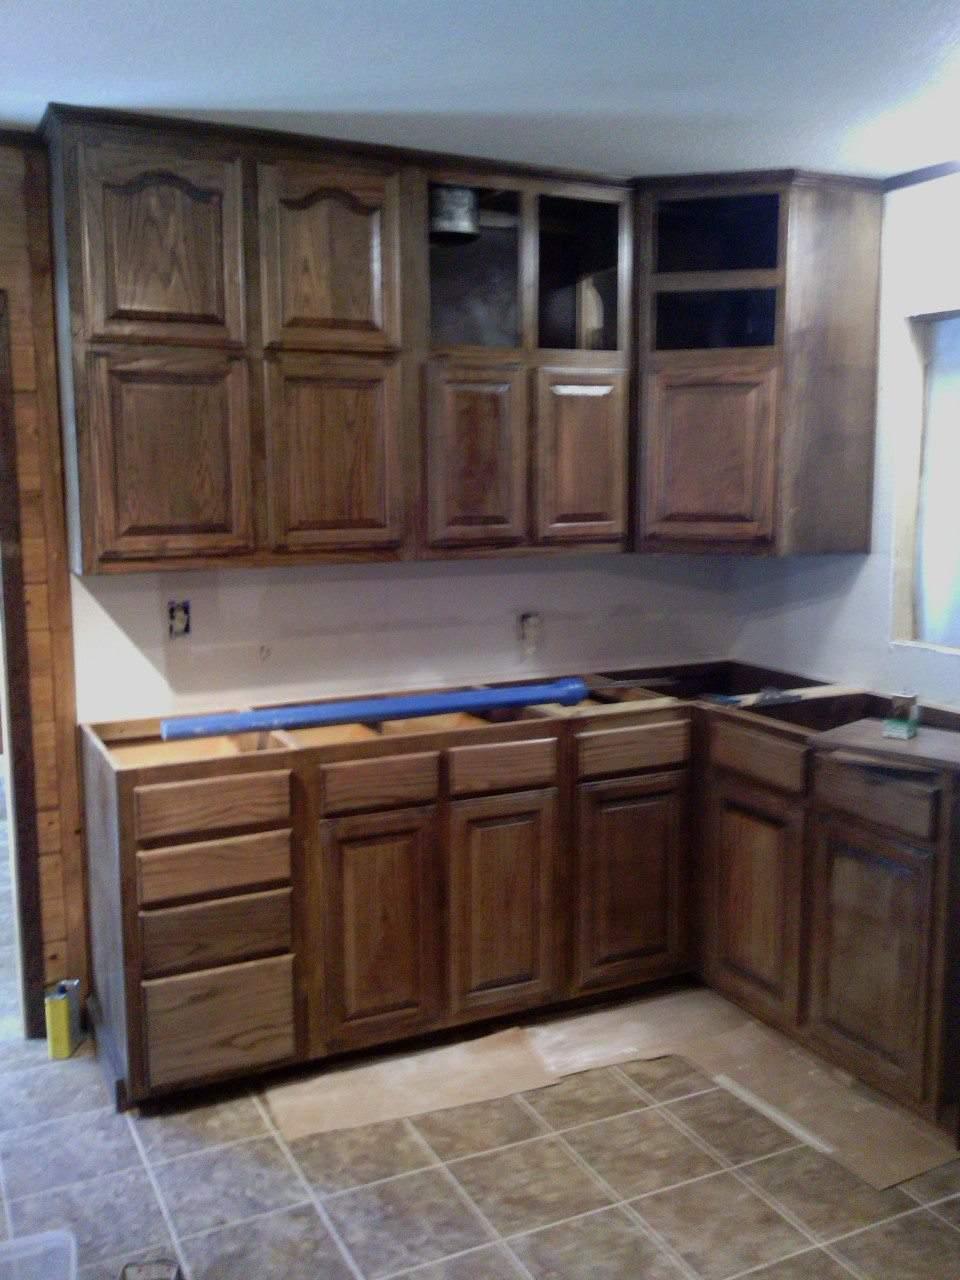 Oak Kitchen cabinets